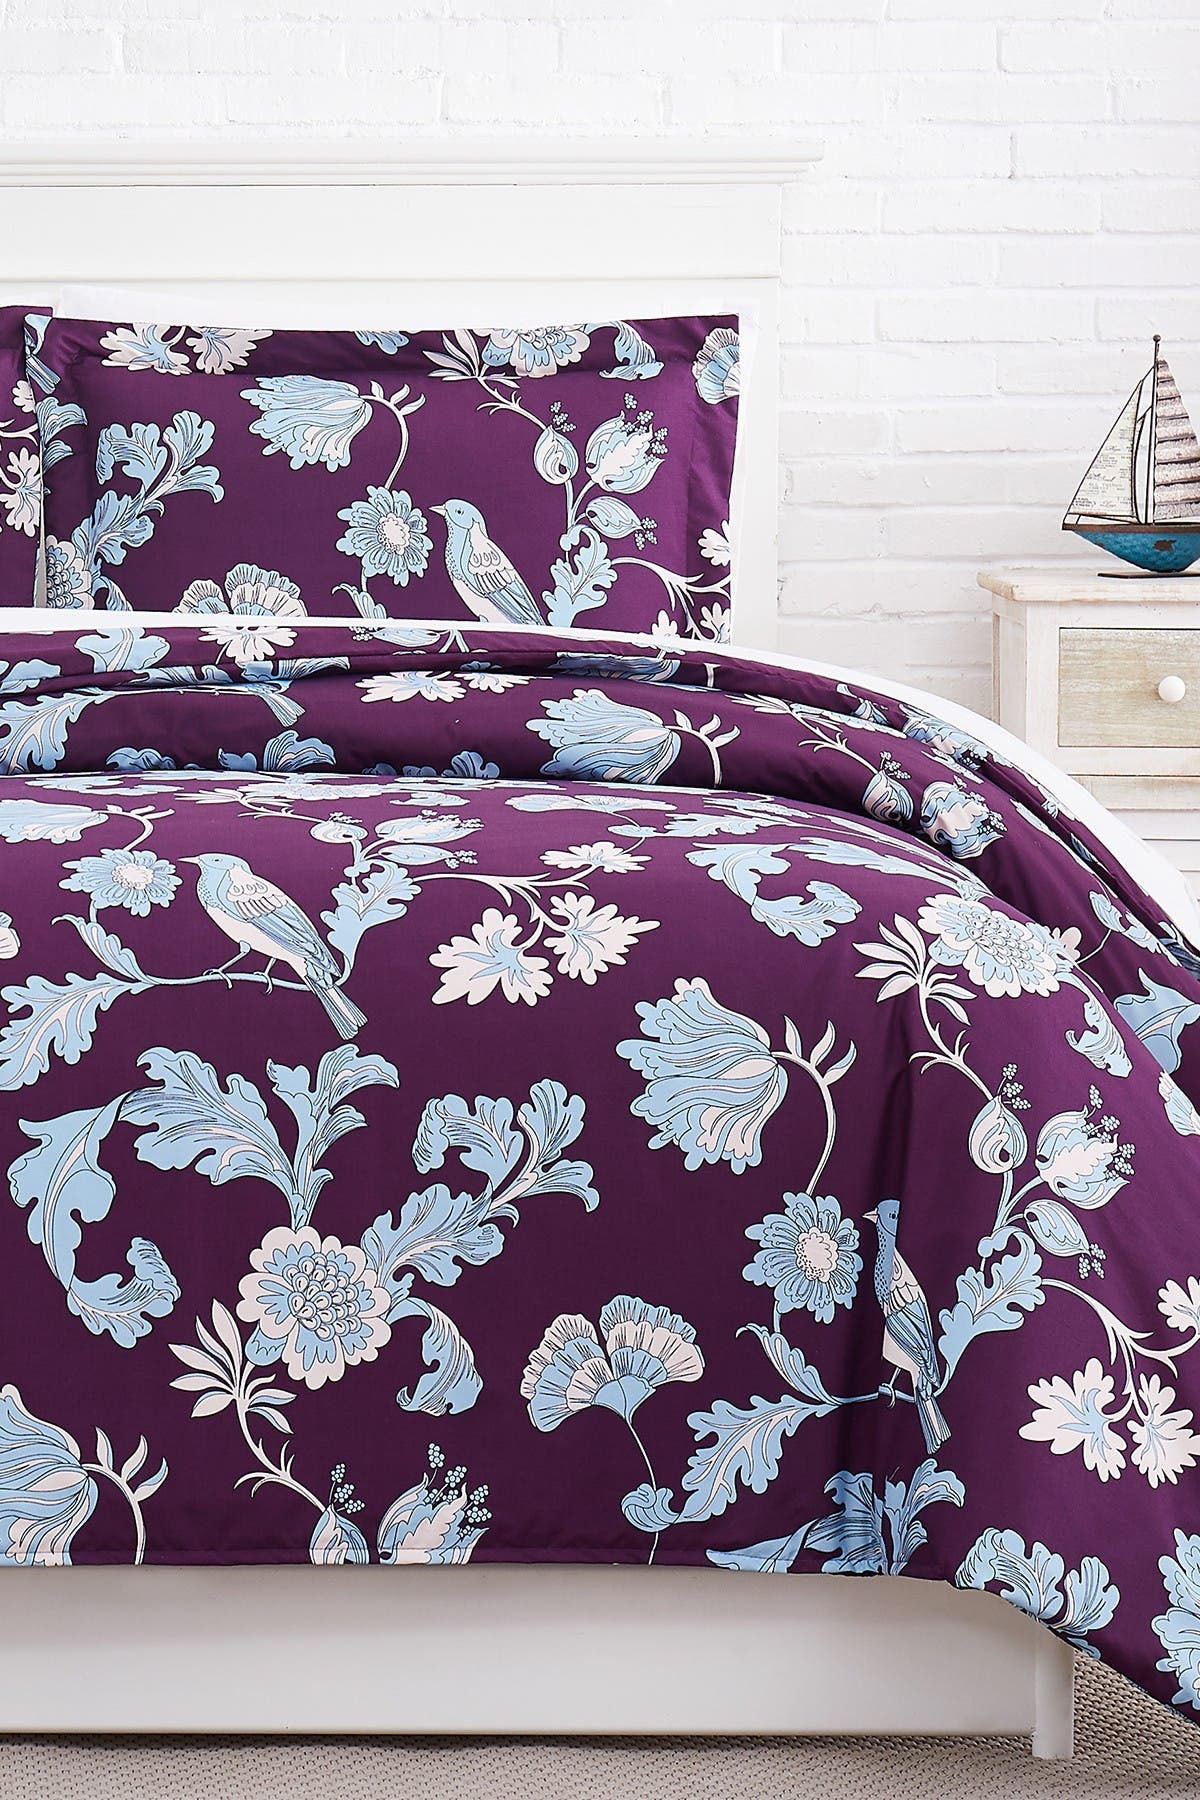 Image of SOUTHSHORE FINE LINENS Premium Collection Oversized Comforter 3-Piece Set - Full/Queen